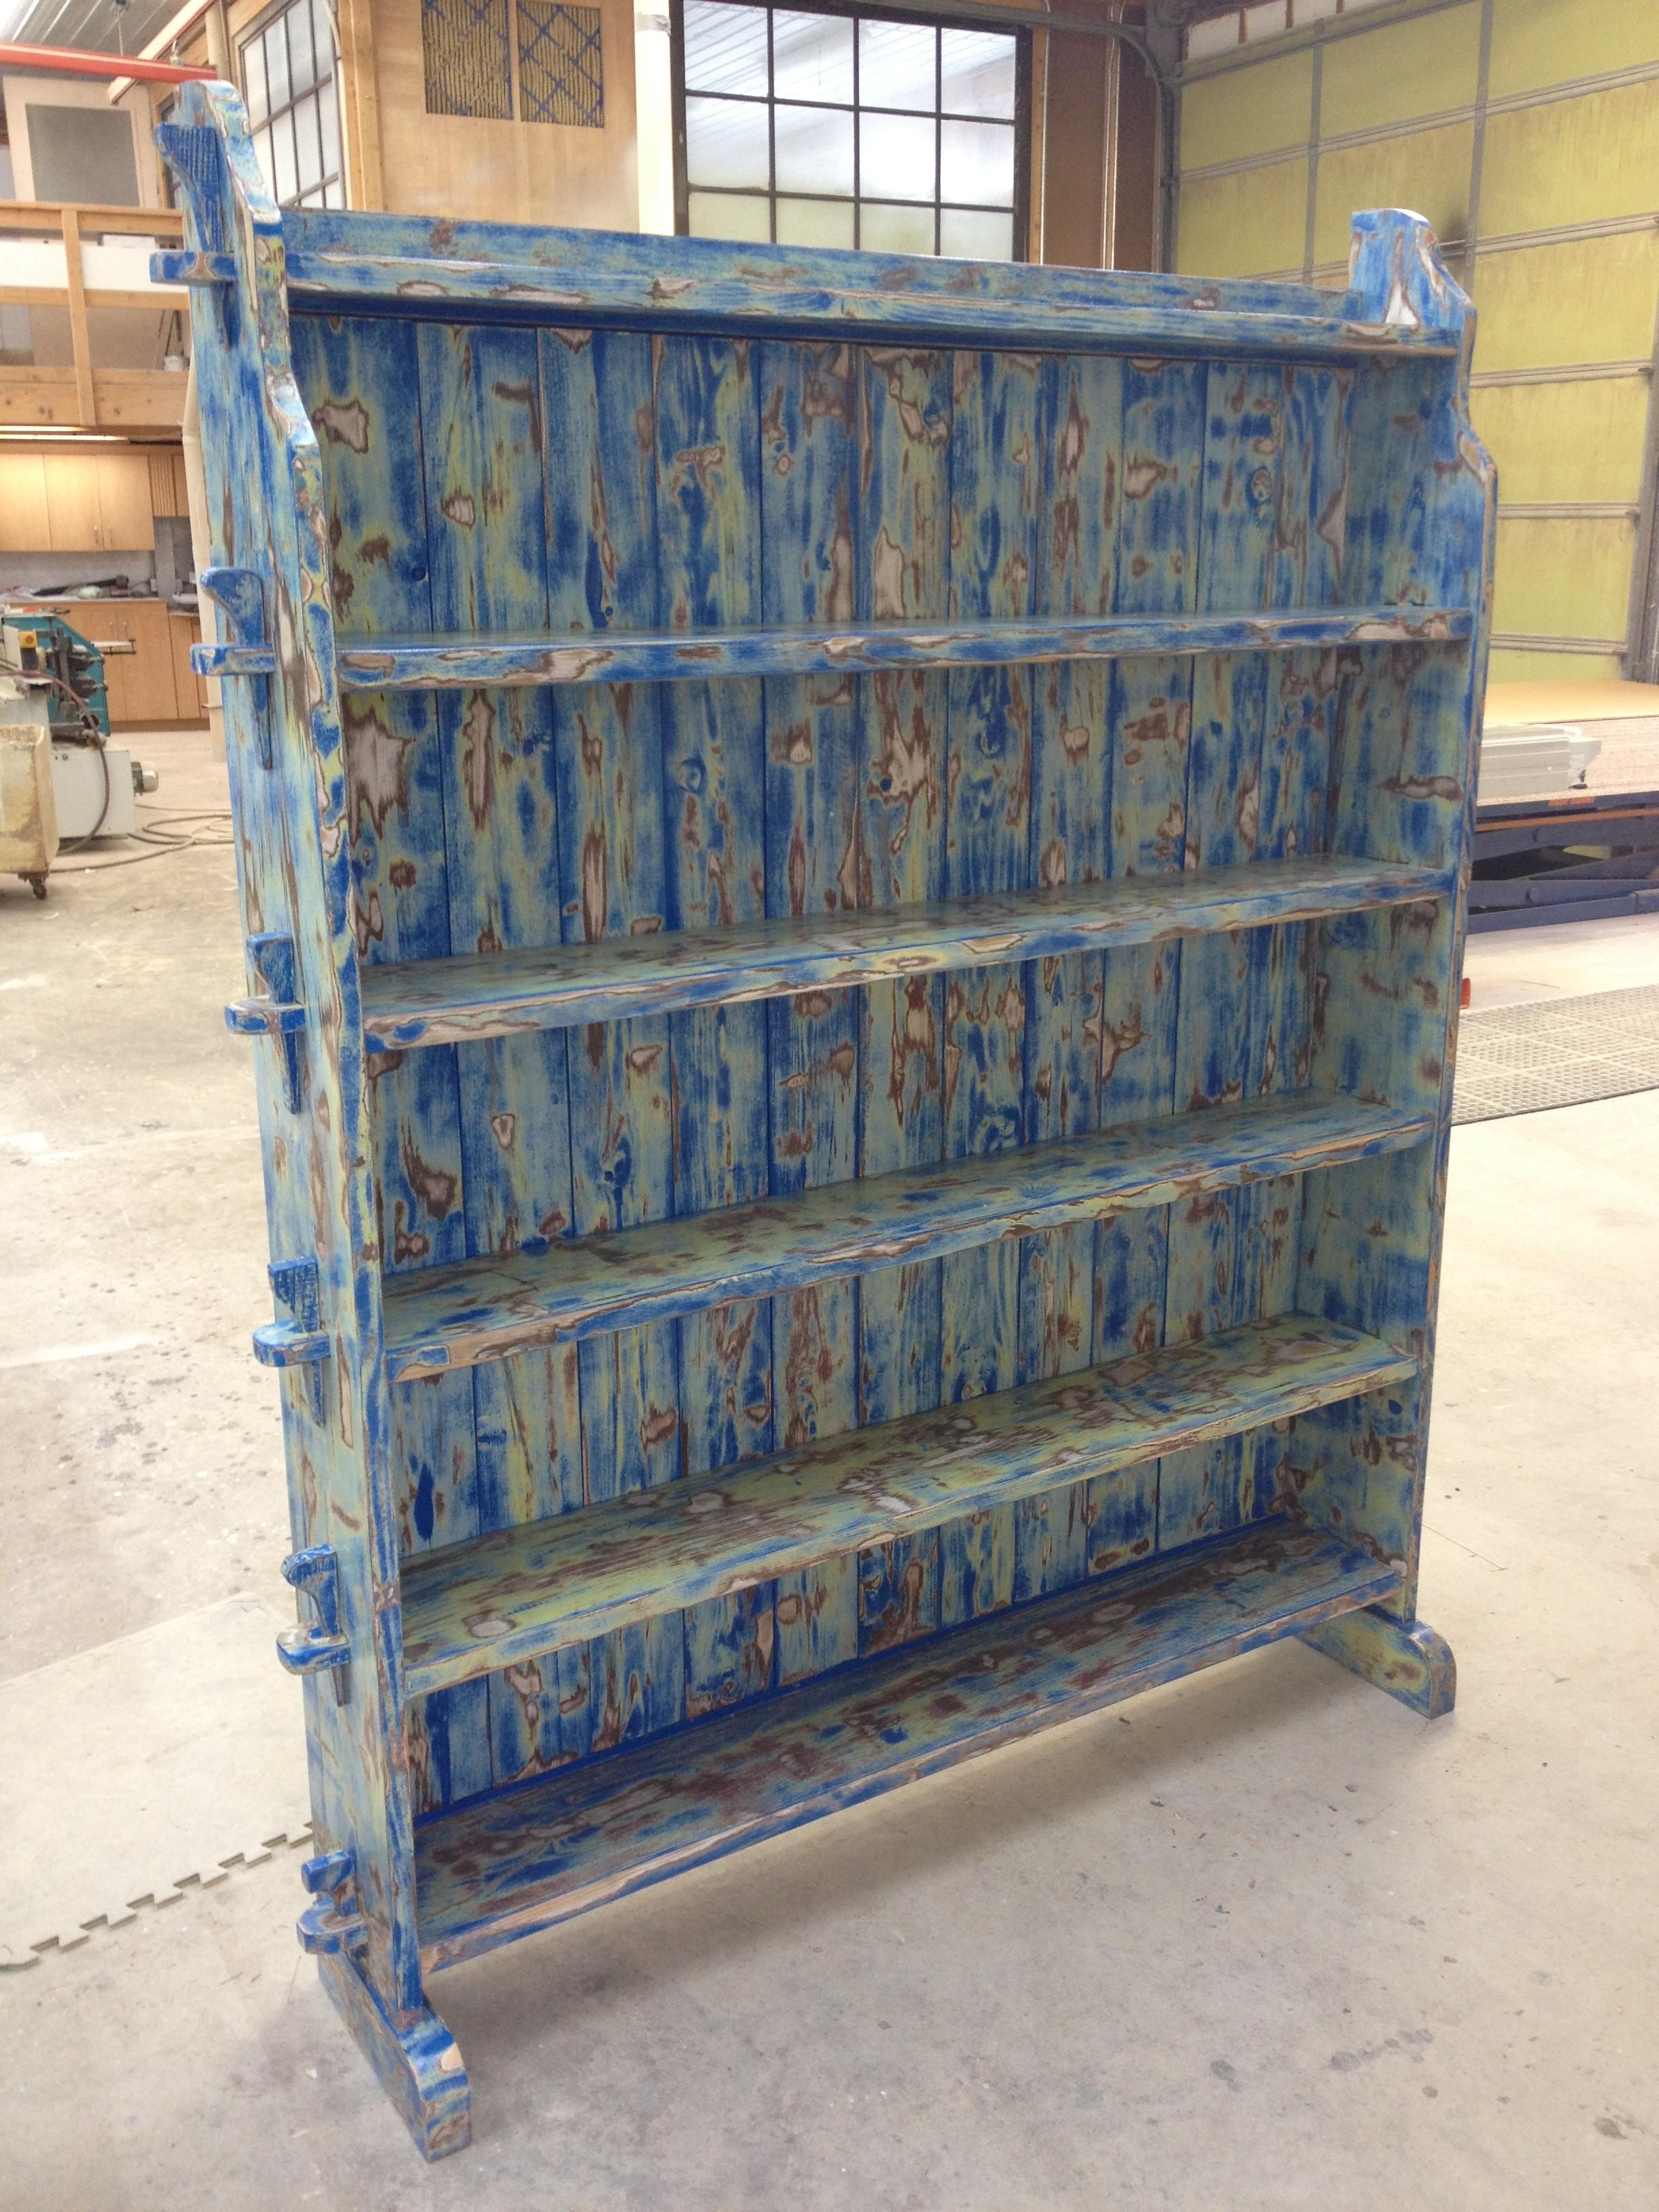 proddetail lakdi customized shelf kitabon custom bookshelf ka shelving